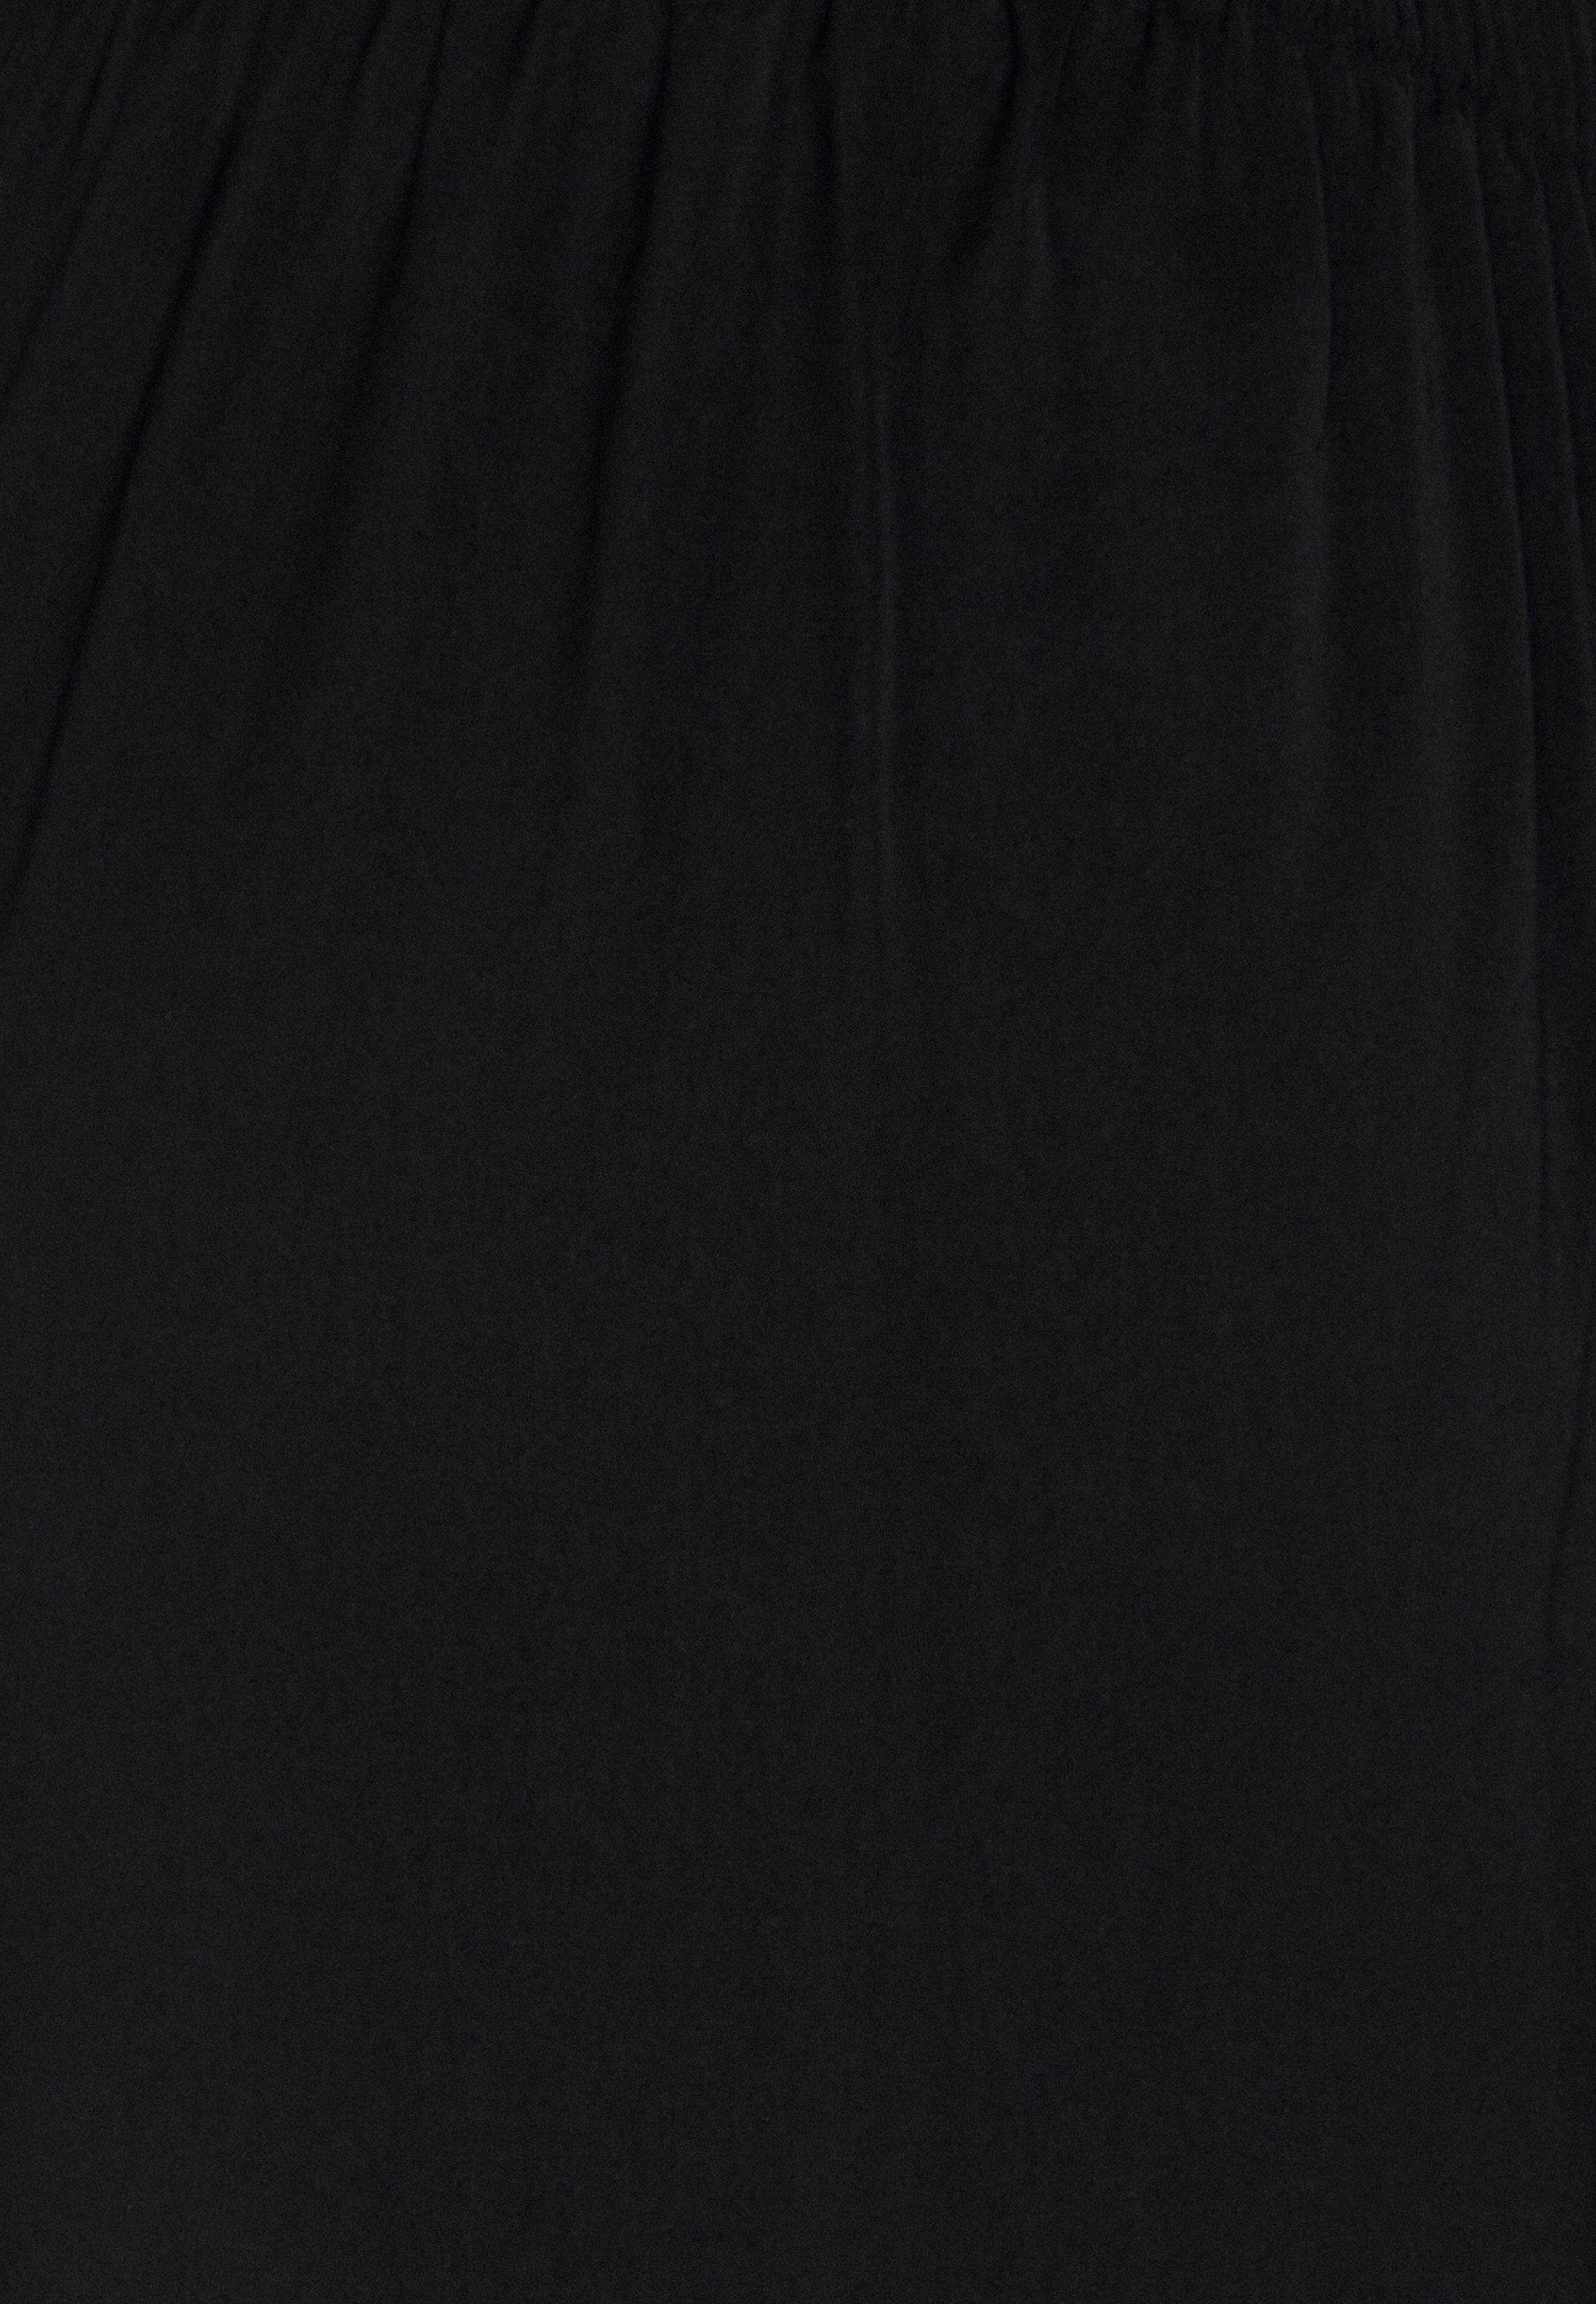 Damen AMANDA LONG PJ SET - Nachtwäsche Set